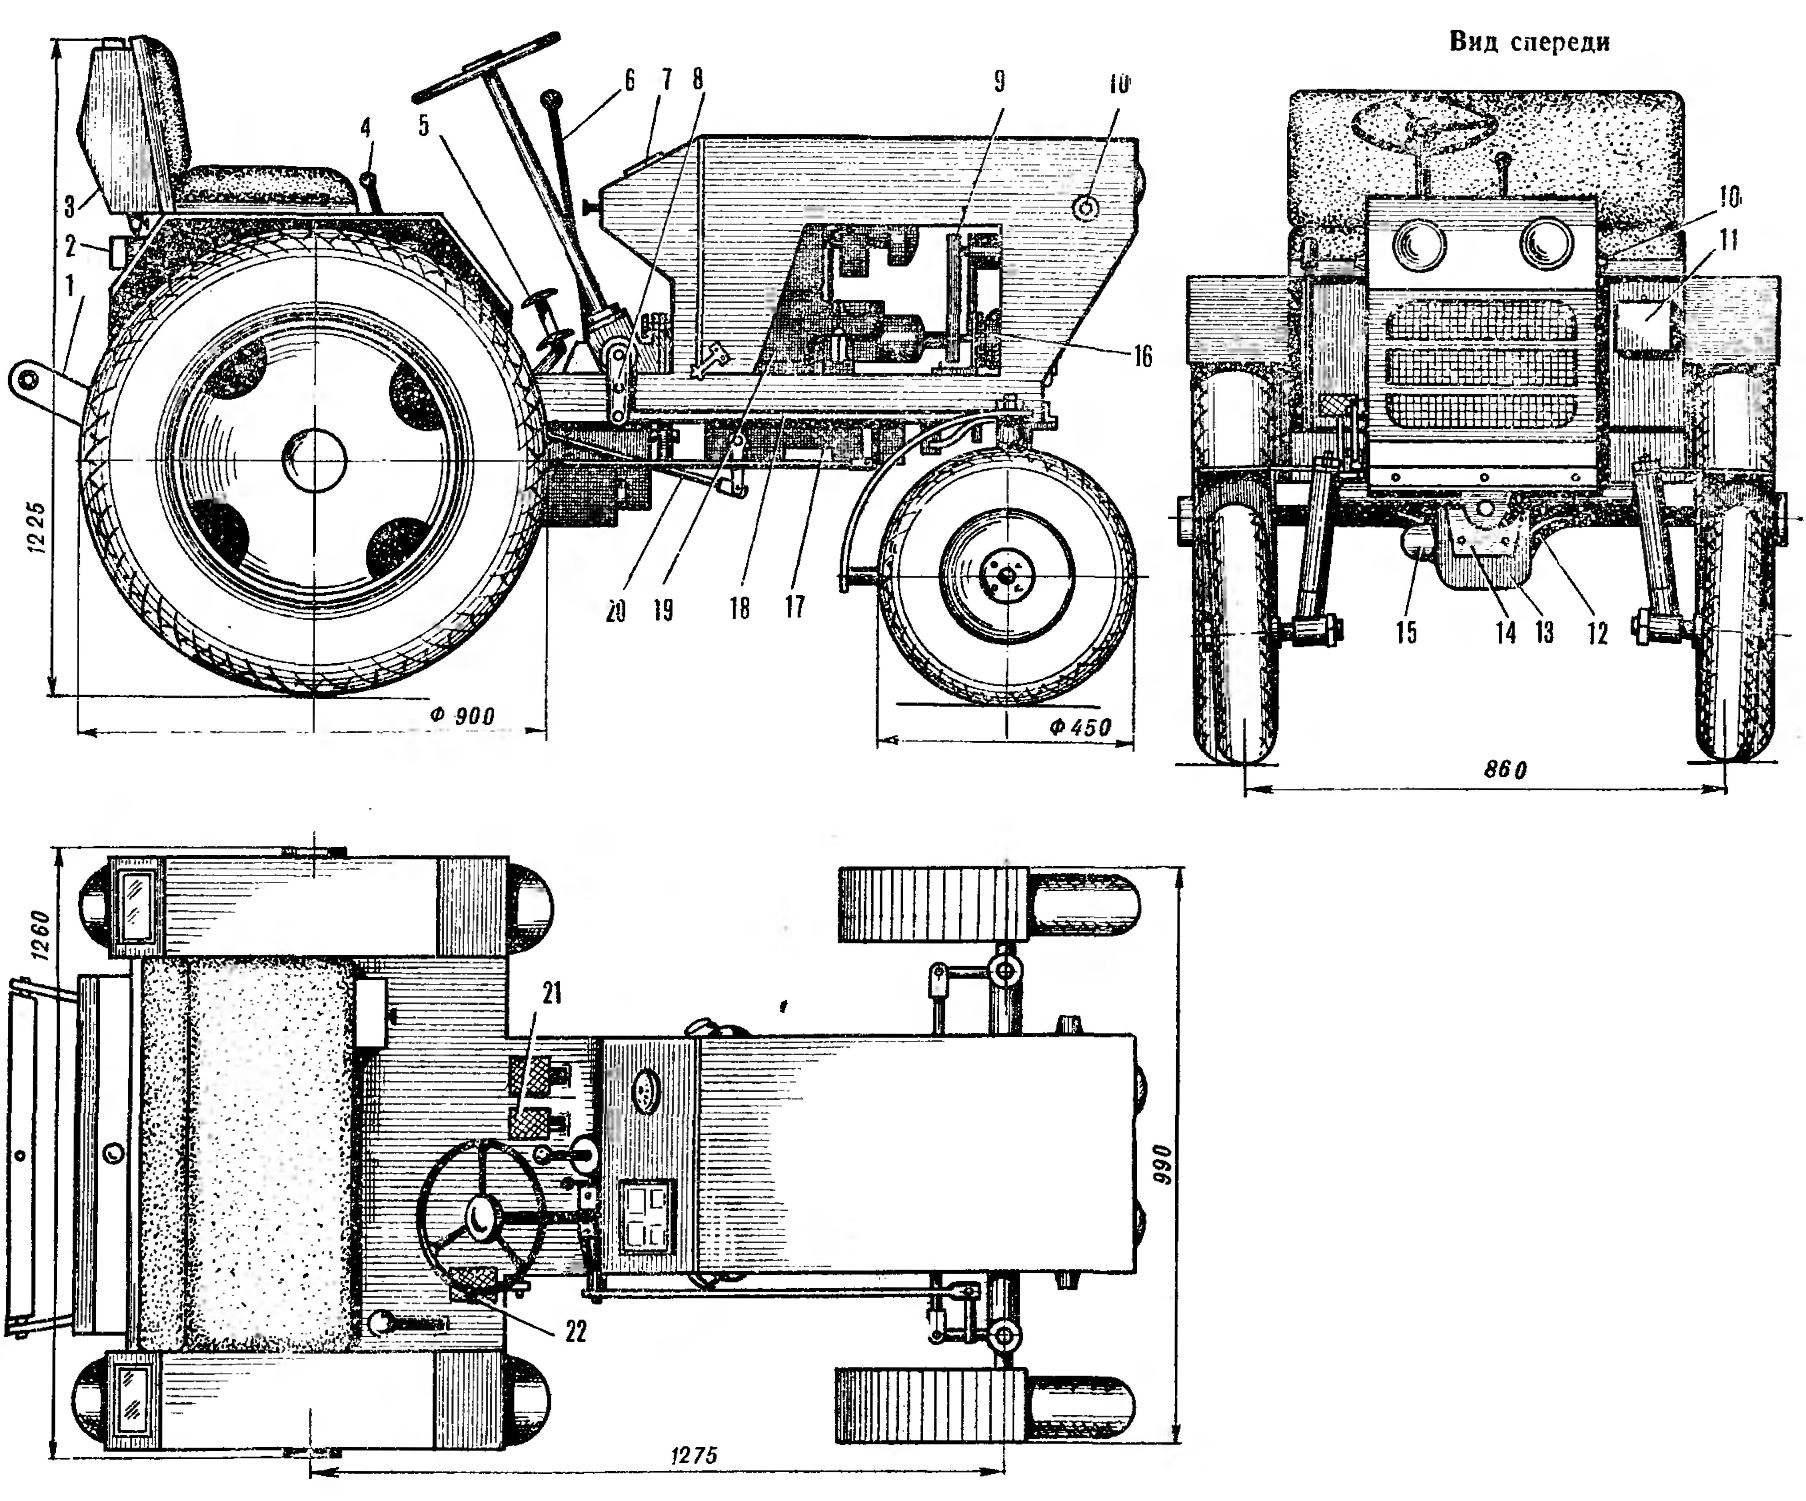 Fig. 1. Microtracker Amurchonok